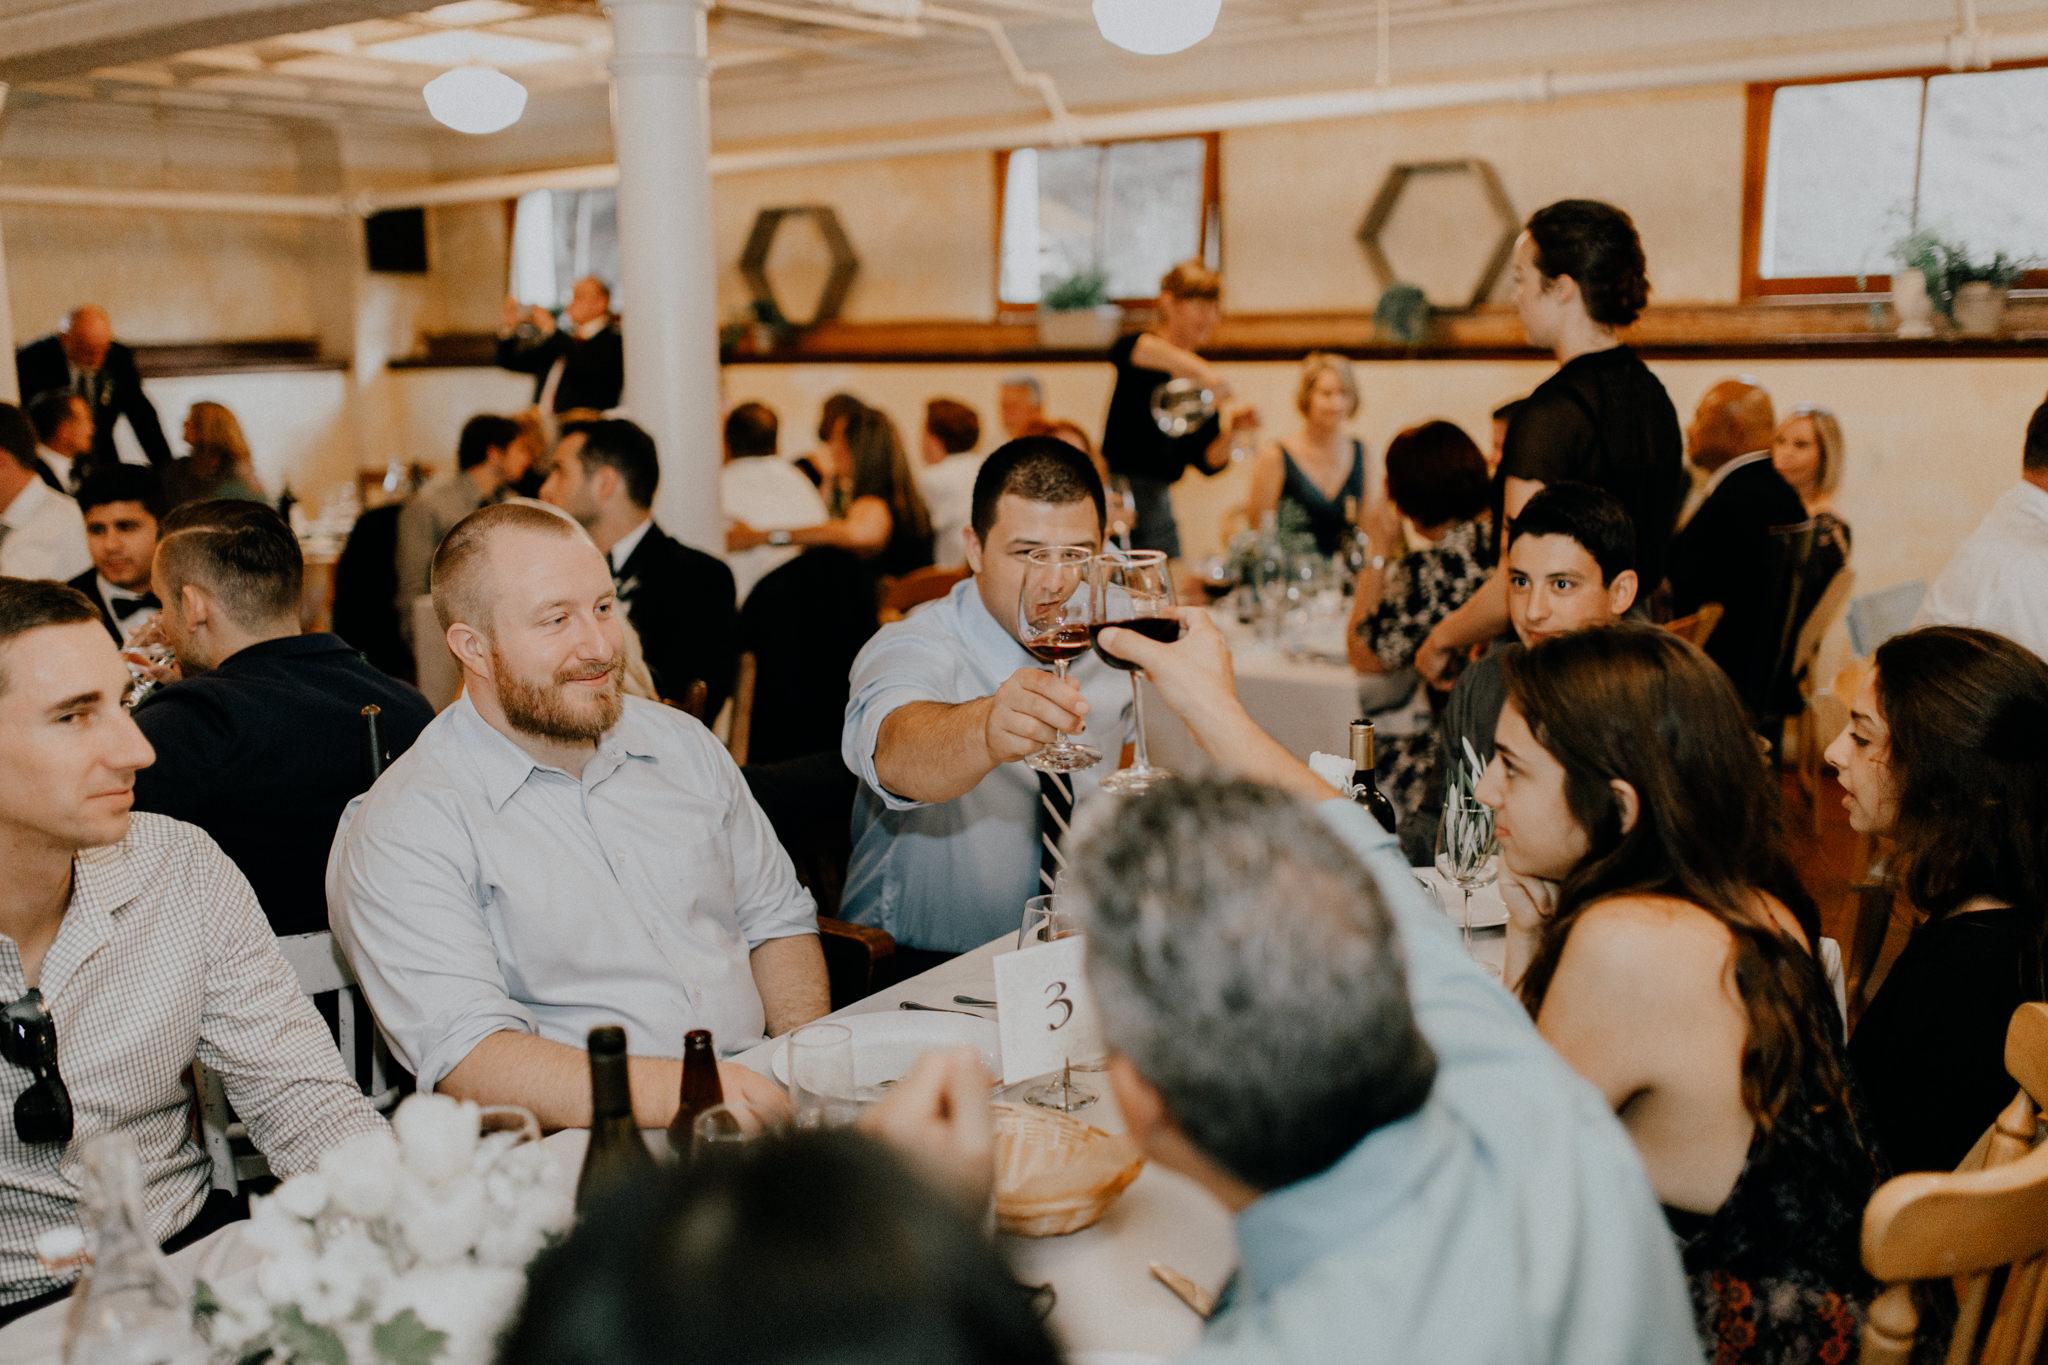 wedding-headlands-center-for-the-arts-sausalito-113.jpg